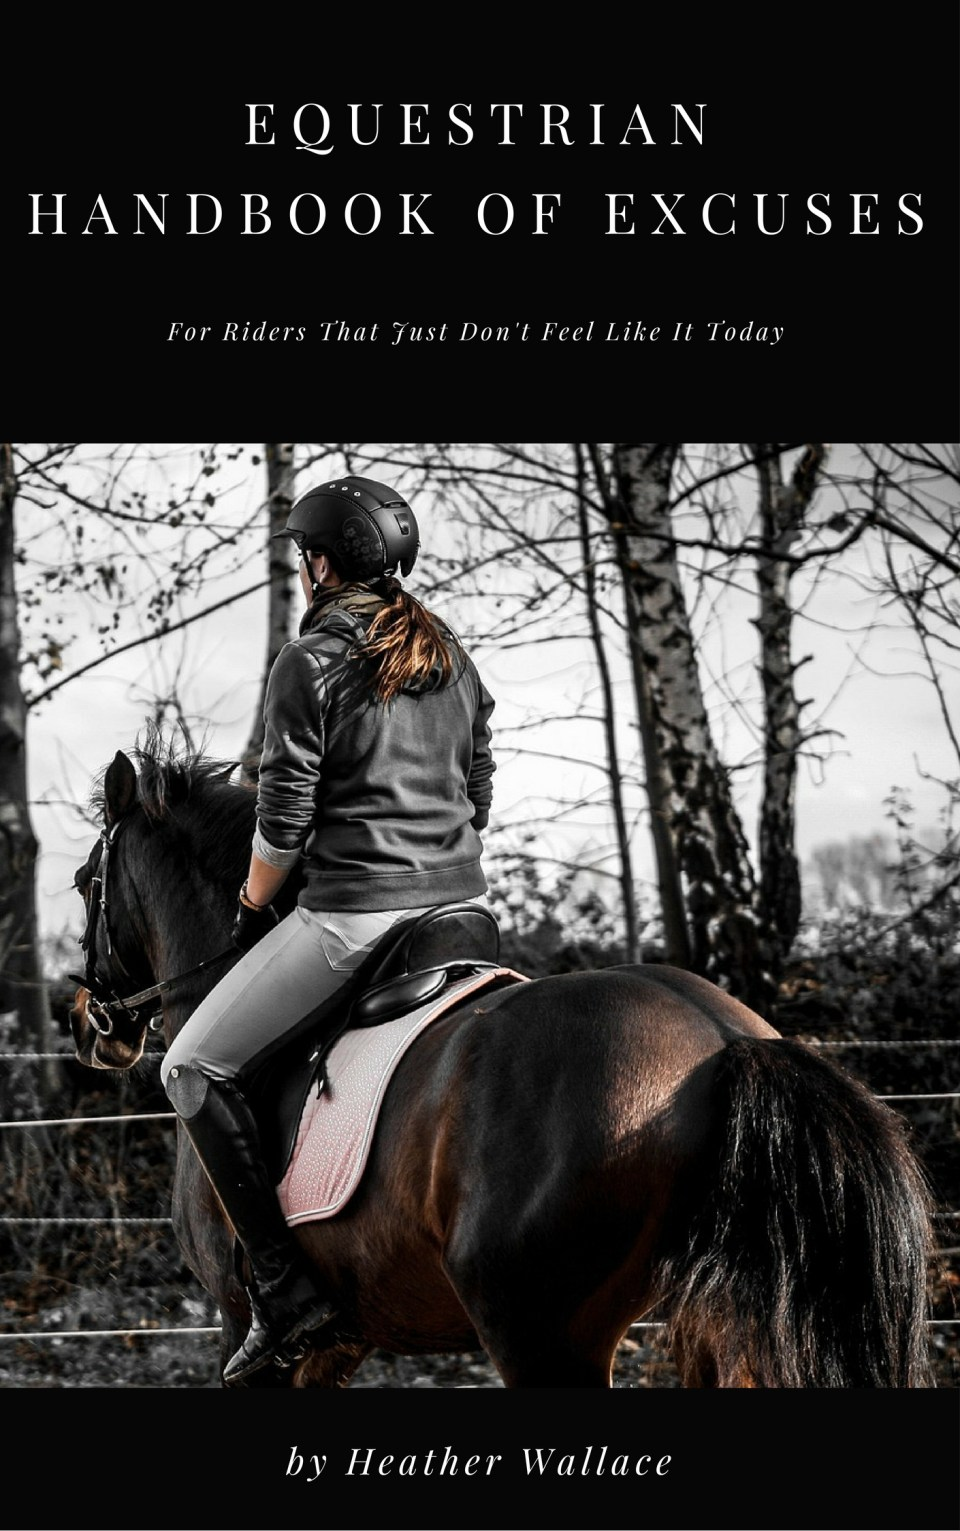 Equestrian Handbook of Excuses